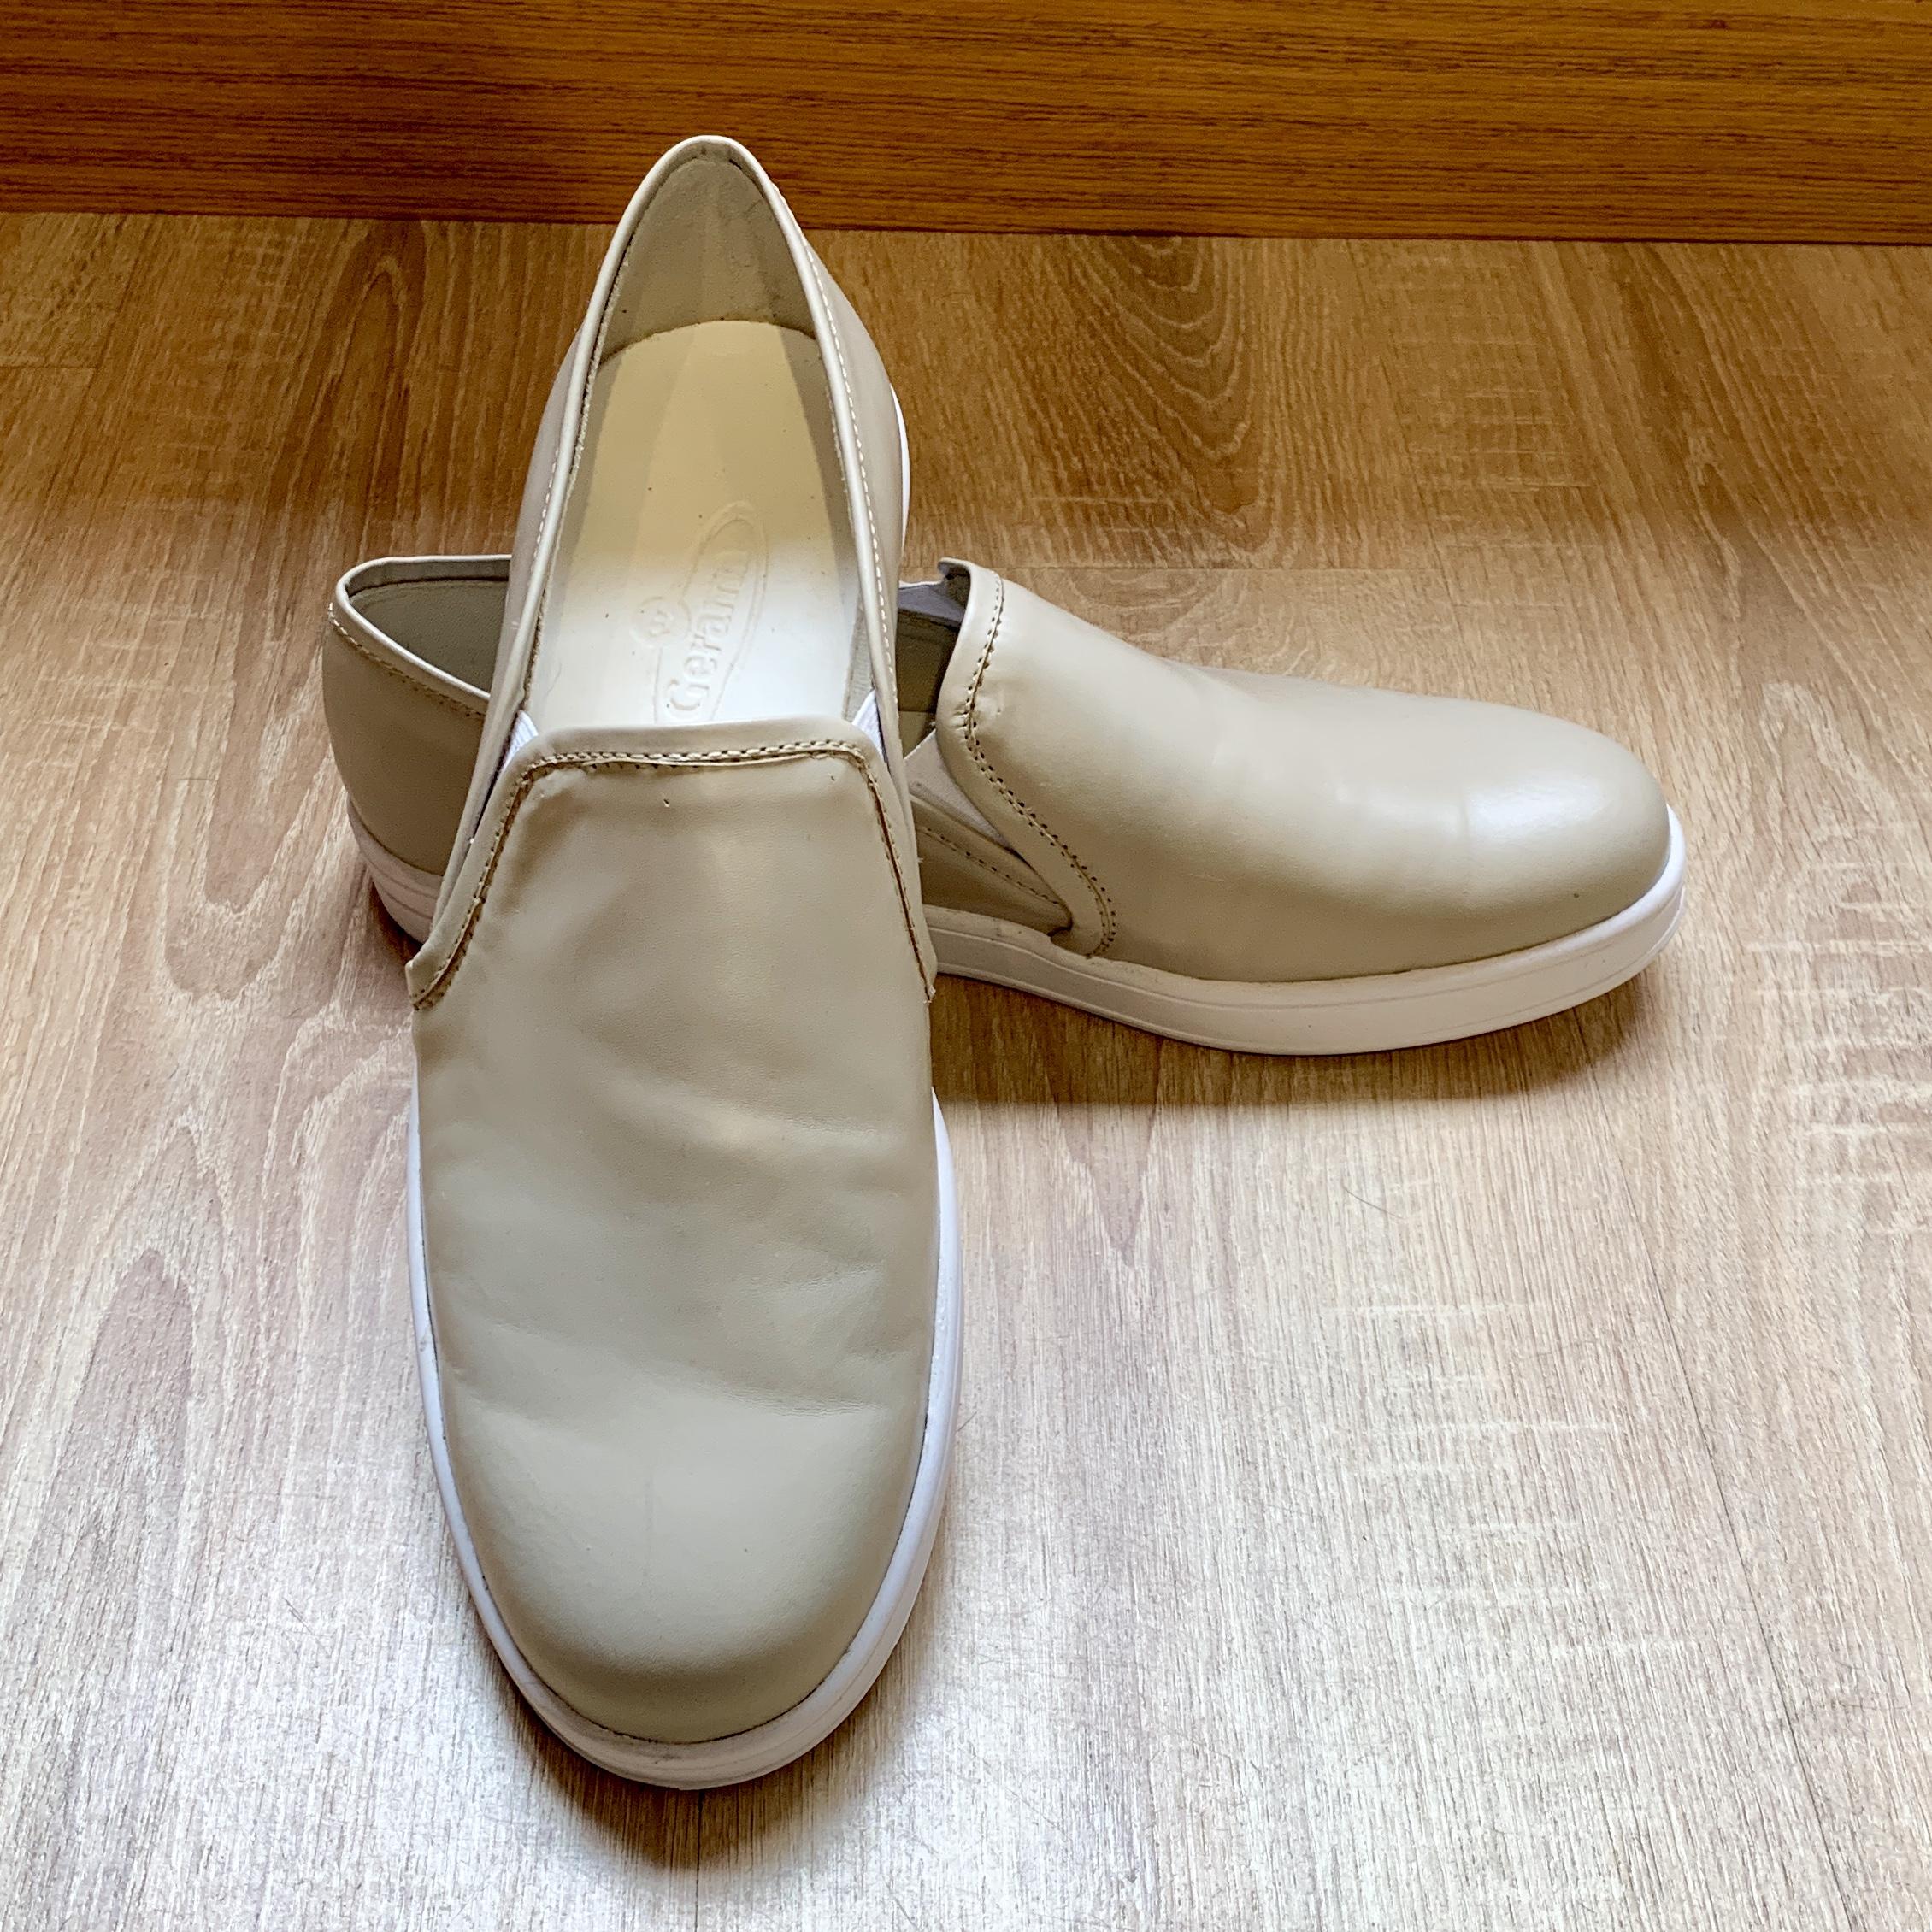 Calzado Antideslizante